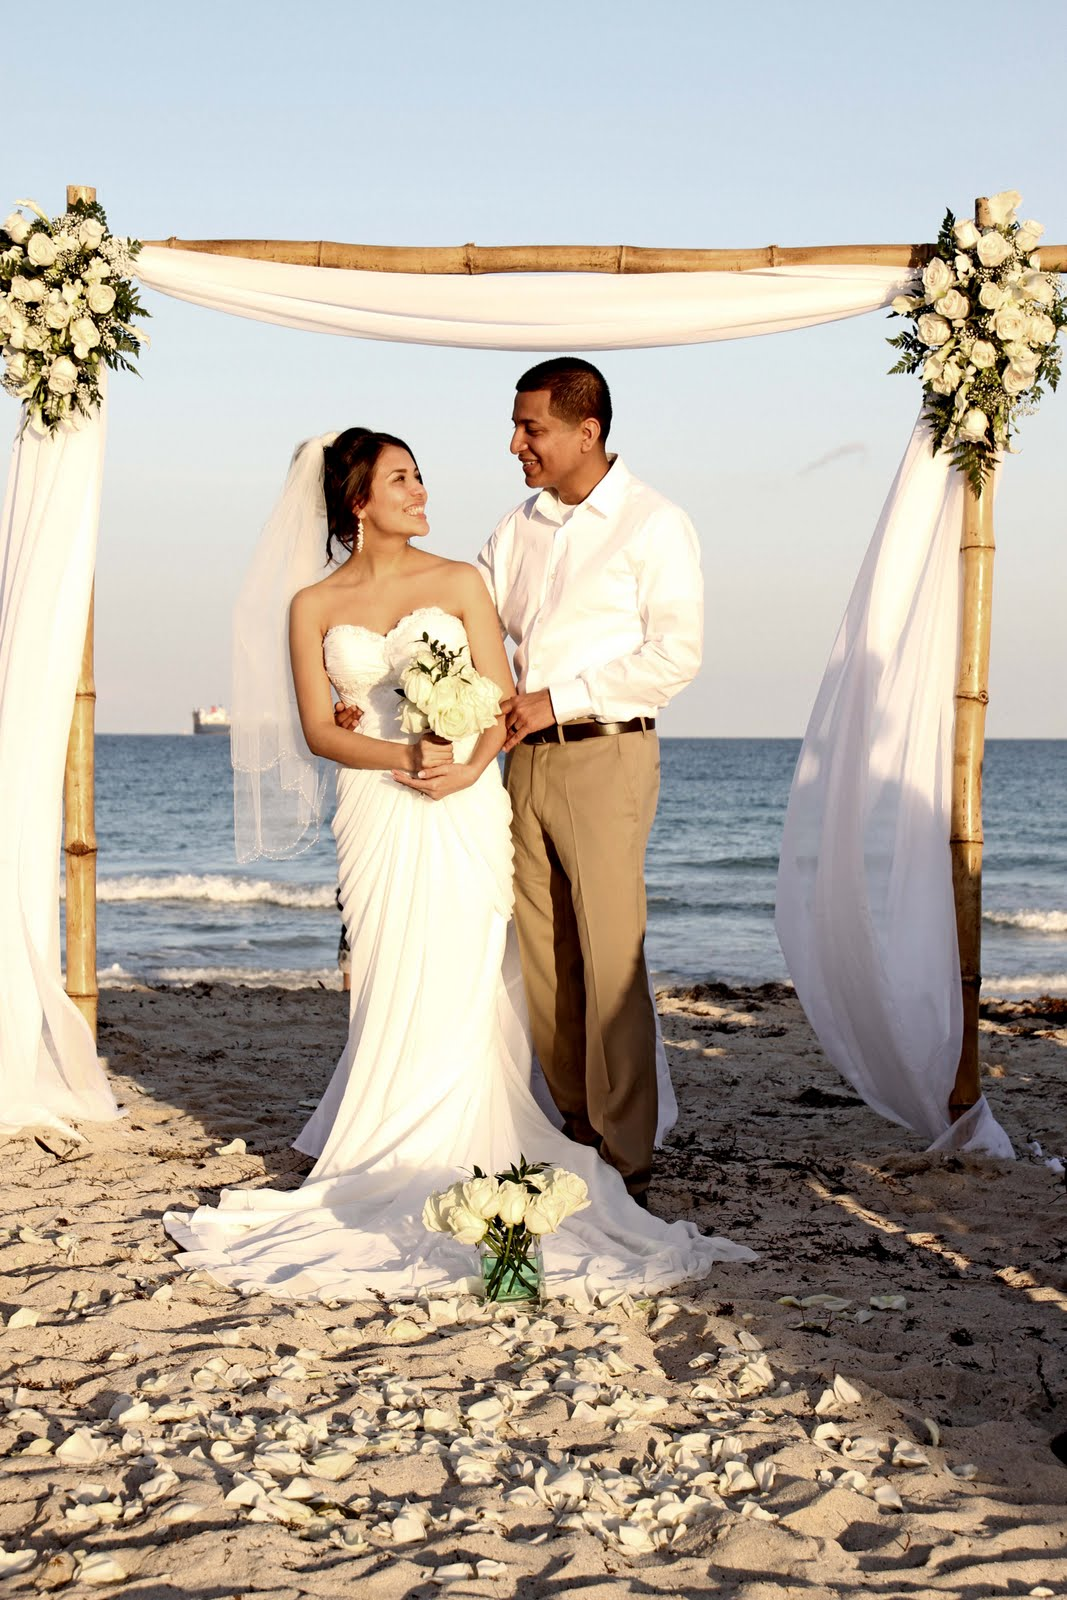 Affordable Beach Weddings! 305-793-4387: Evelyn & Juan's